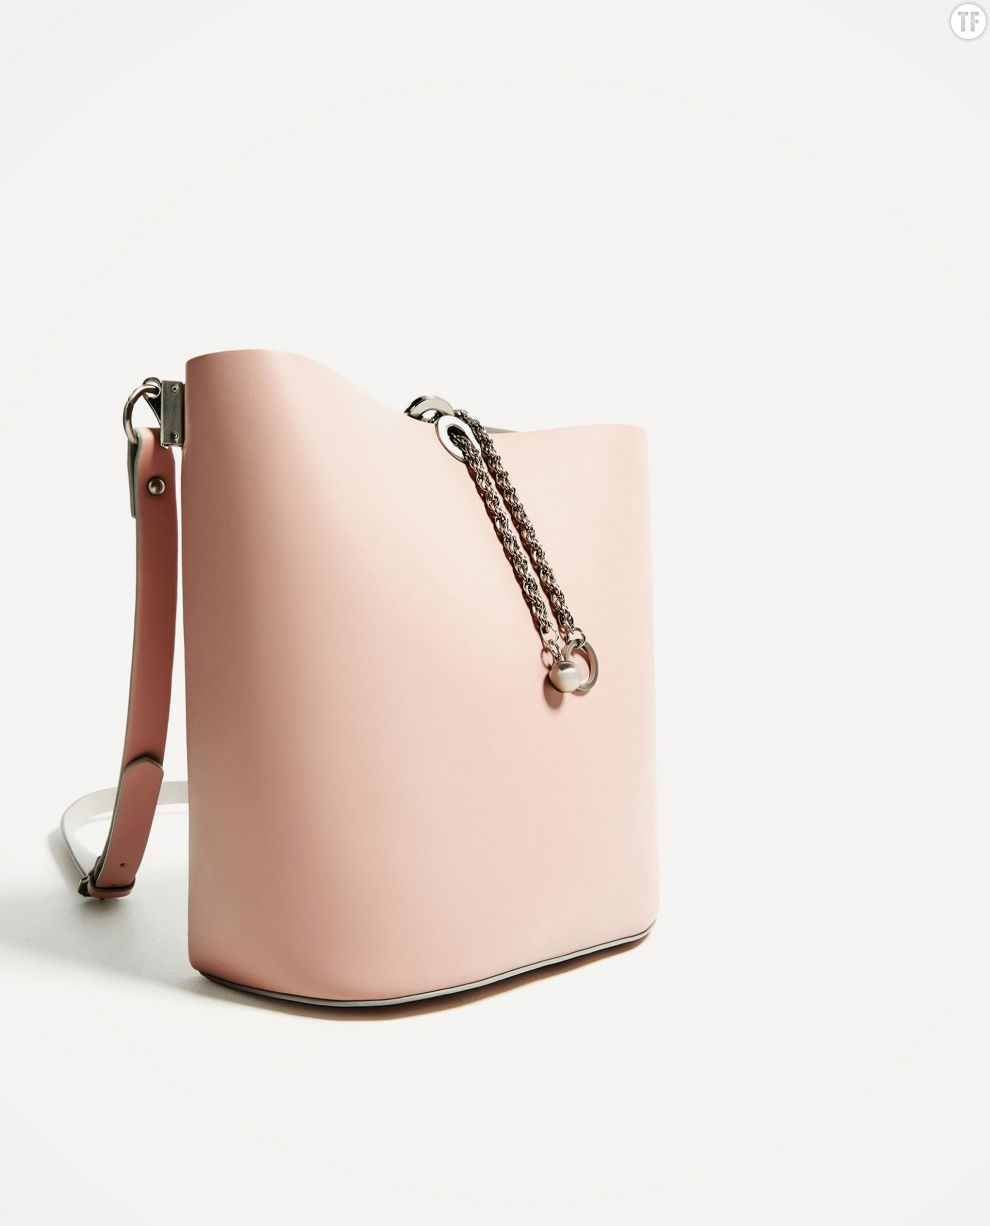 Sac seau avec chaîne Zara, 39,95€